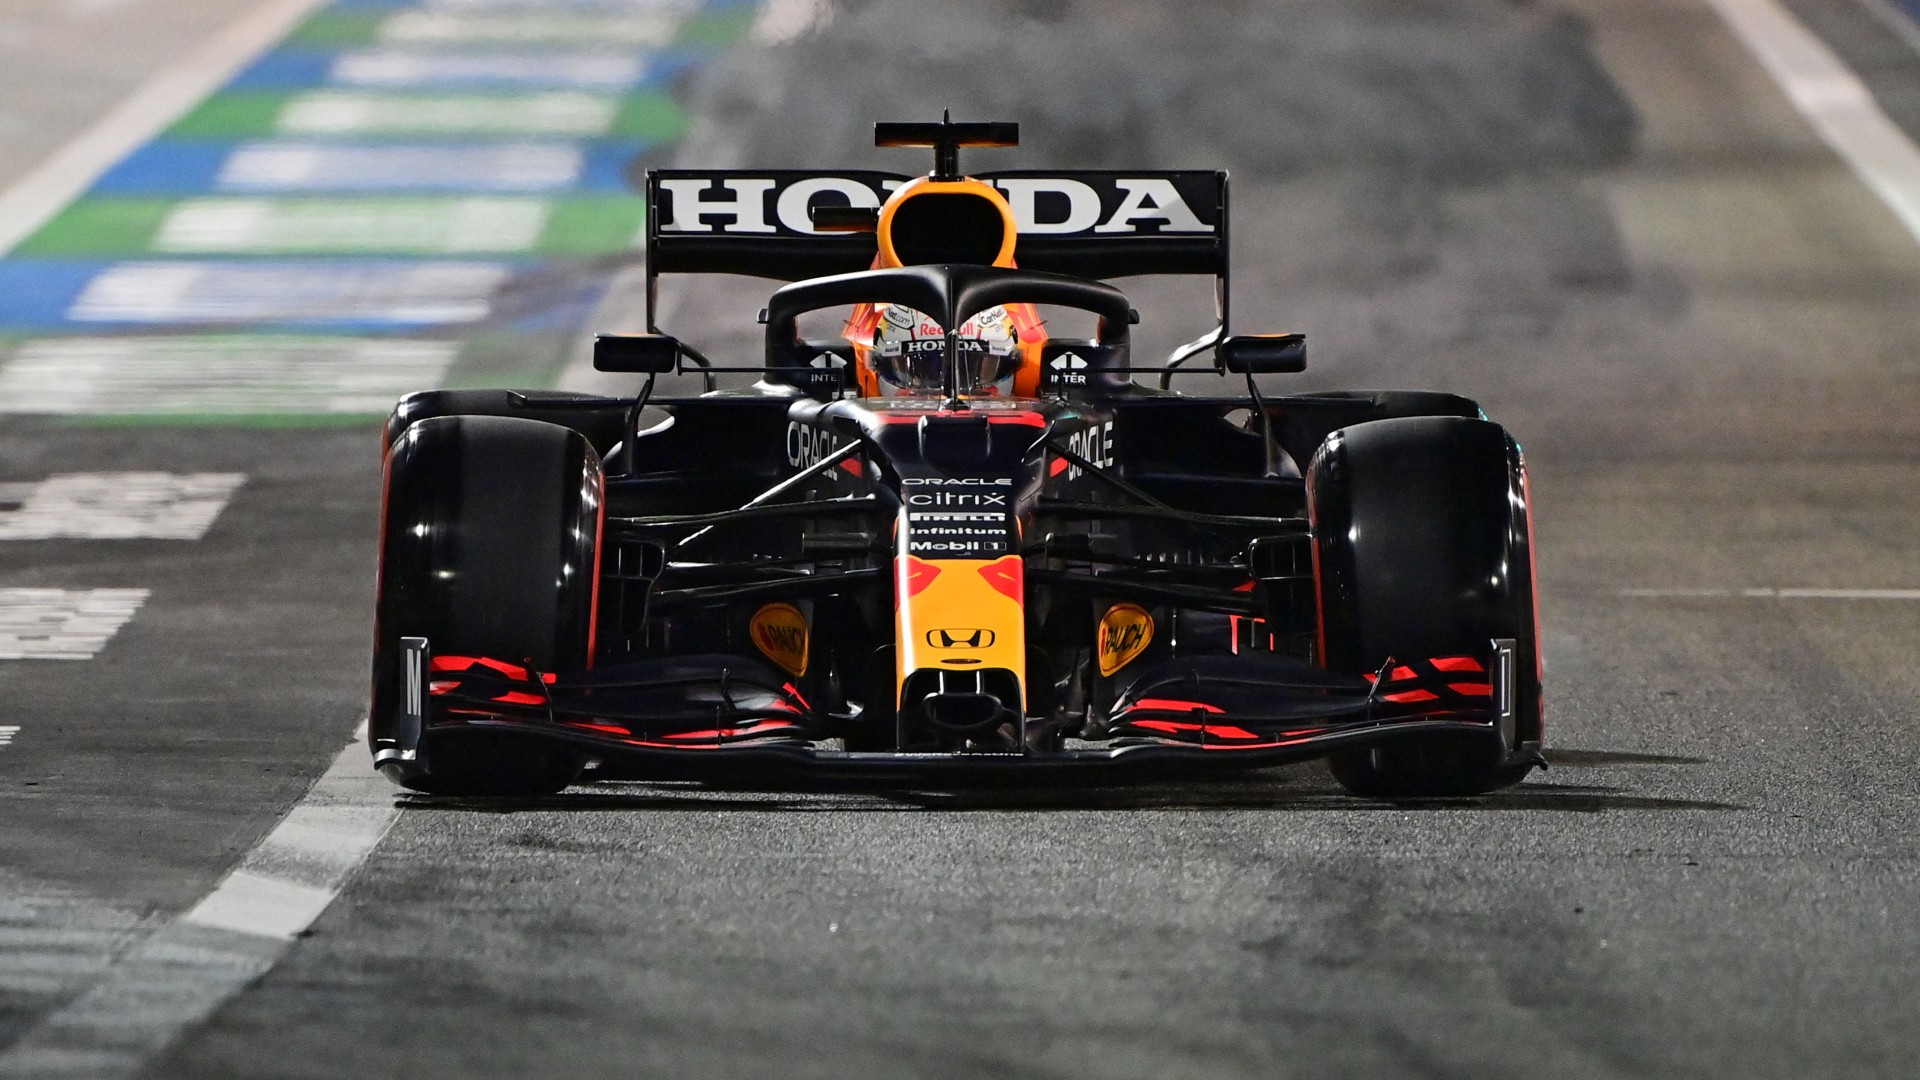 F1 f1 qualifying live stream at on 24/7. Formula 1 Qualifying Results Starting Grid For 2021 Bahrain Grand Prix Sporting News Australia